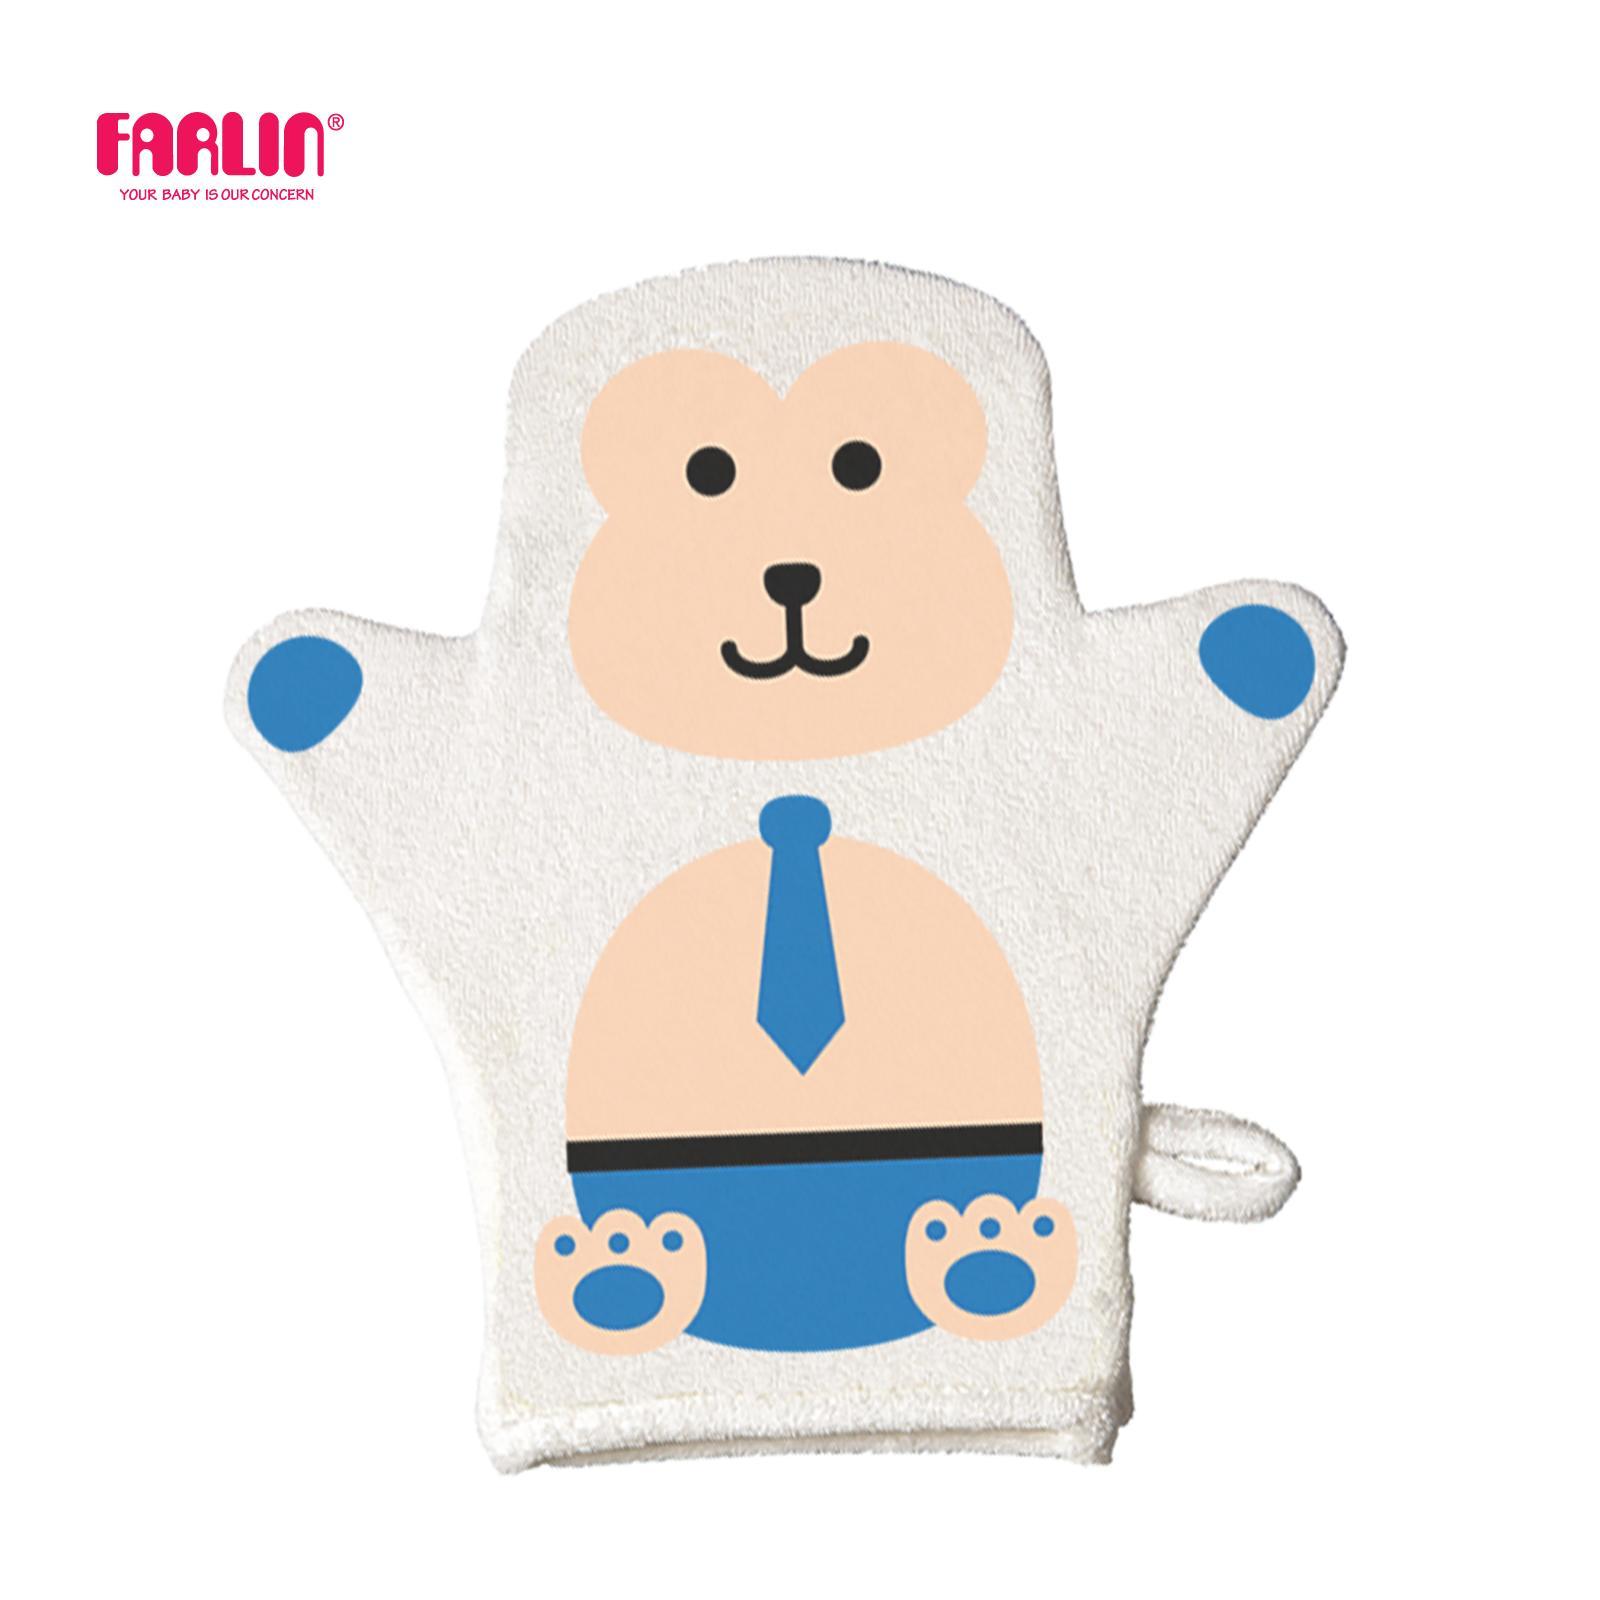 Farlin Wash Mitten 100% Terry Cloth